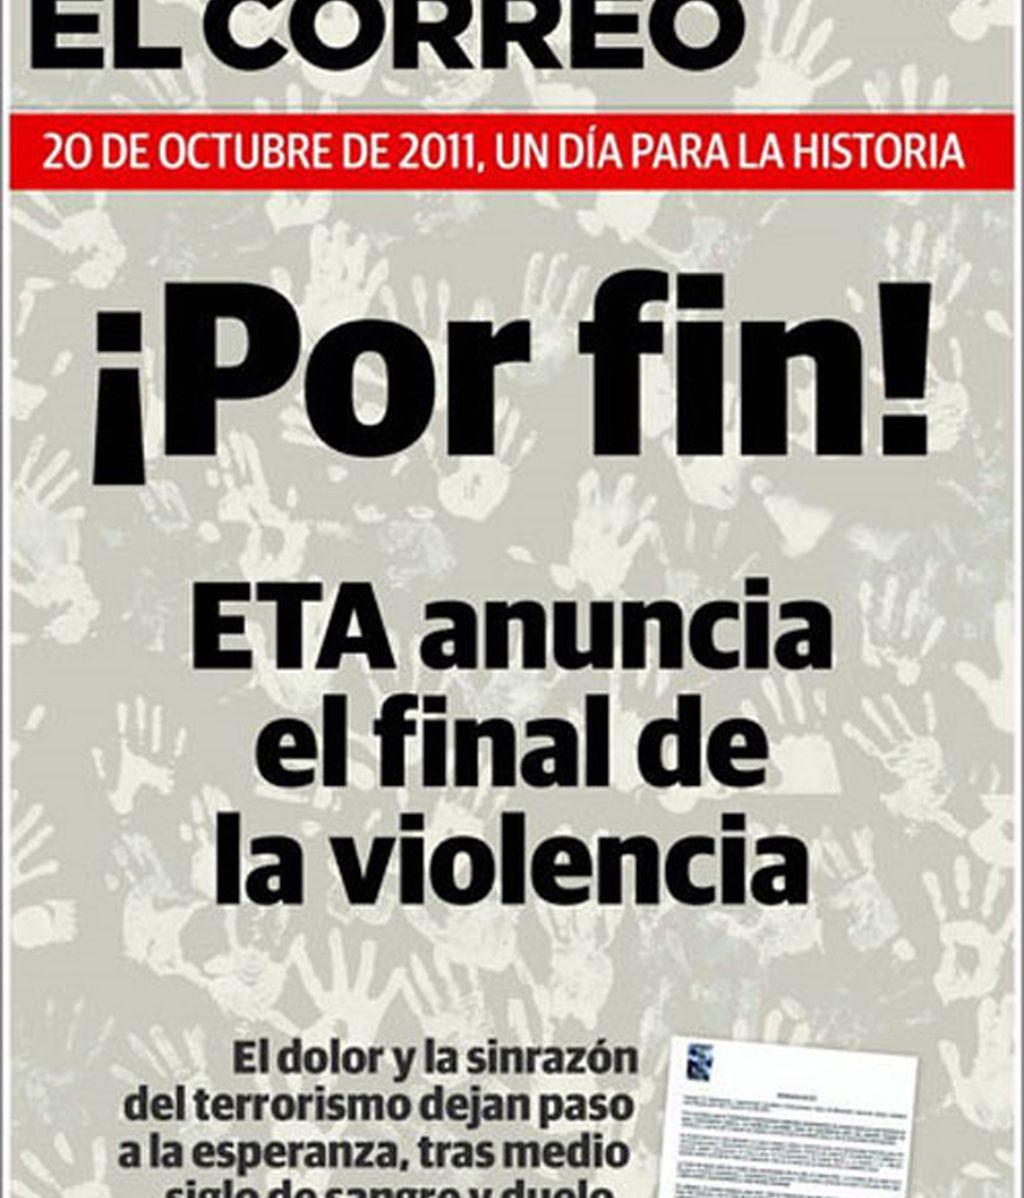 El fin de ETA en la prensa